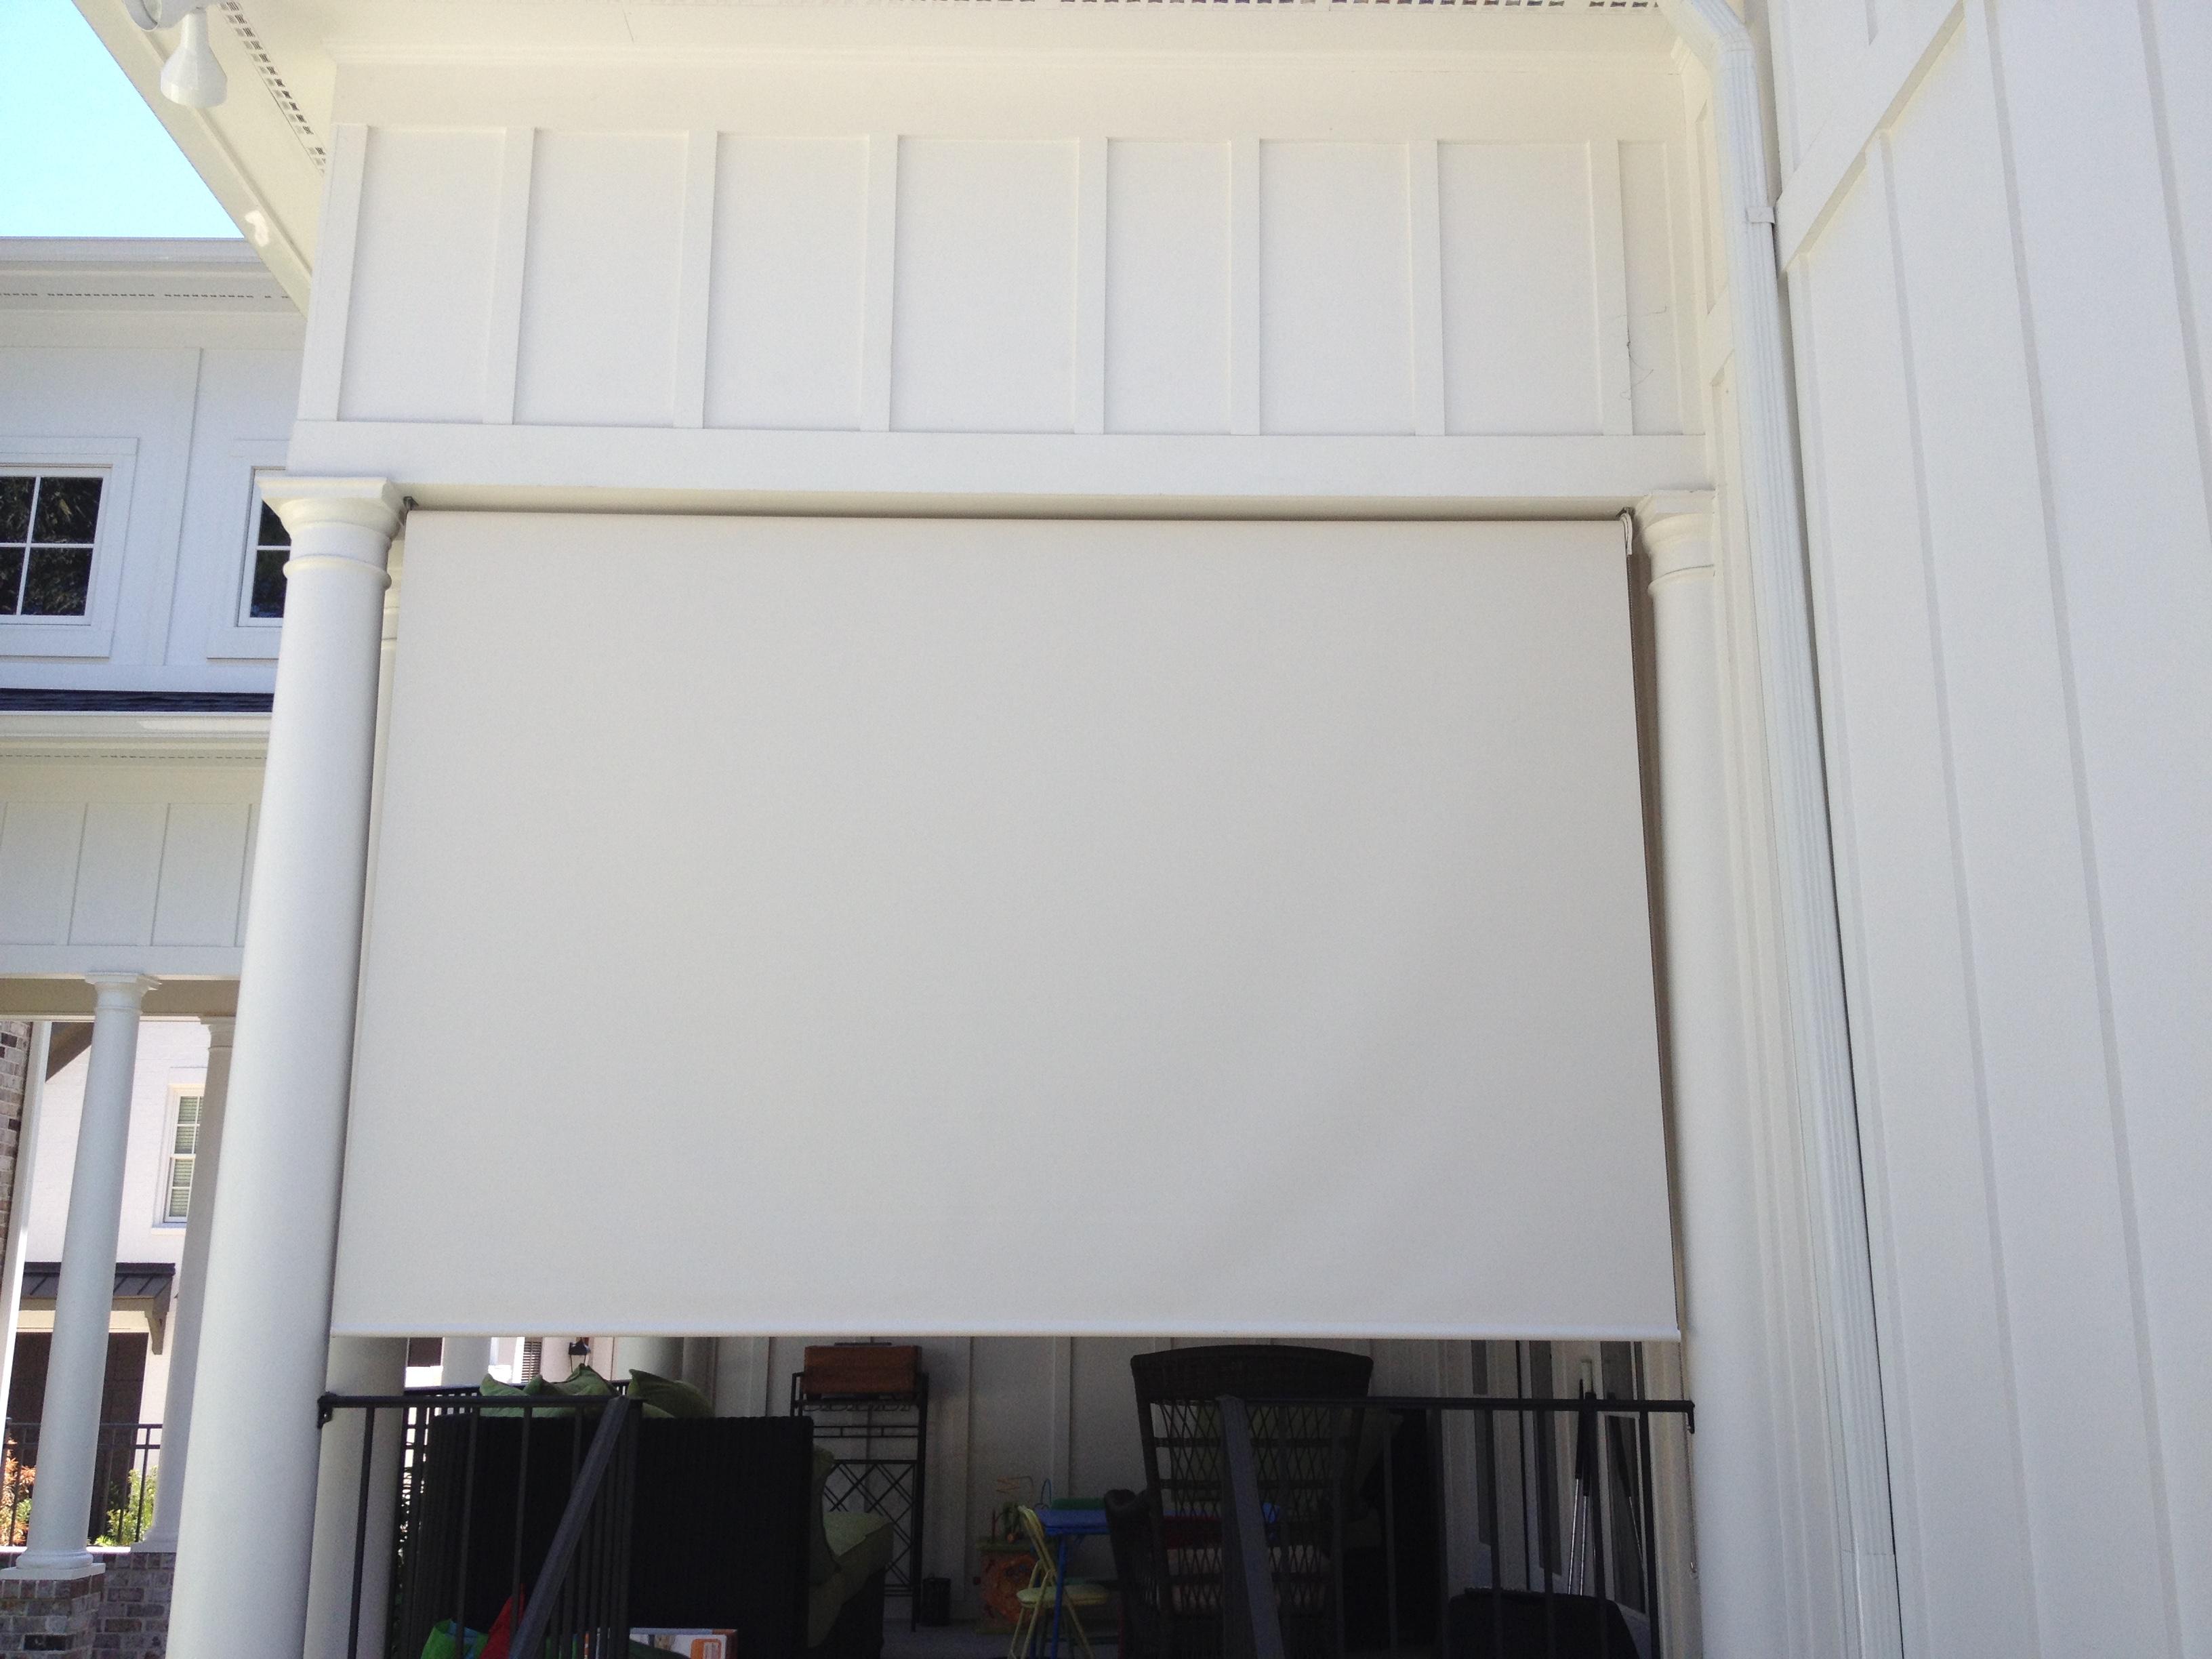 Ext Roller Screen 1 Outside View Carolina Blind Shutter Inc